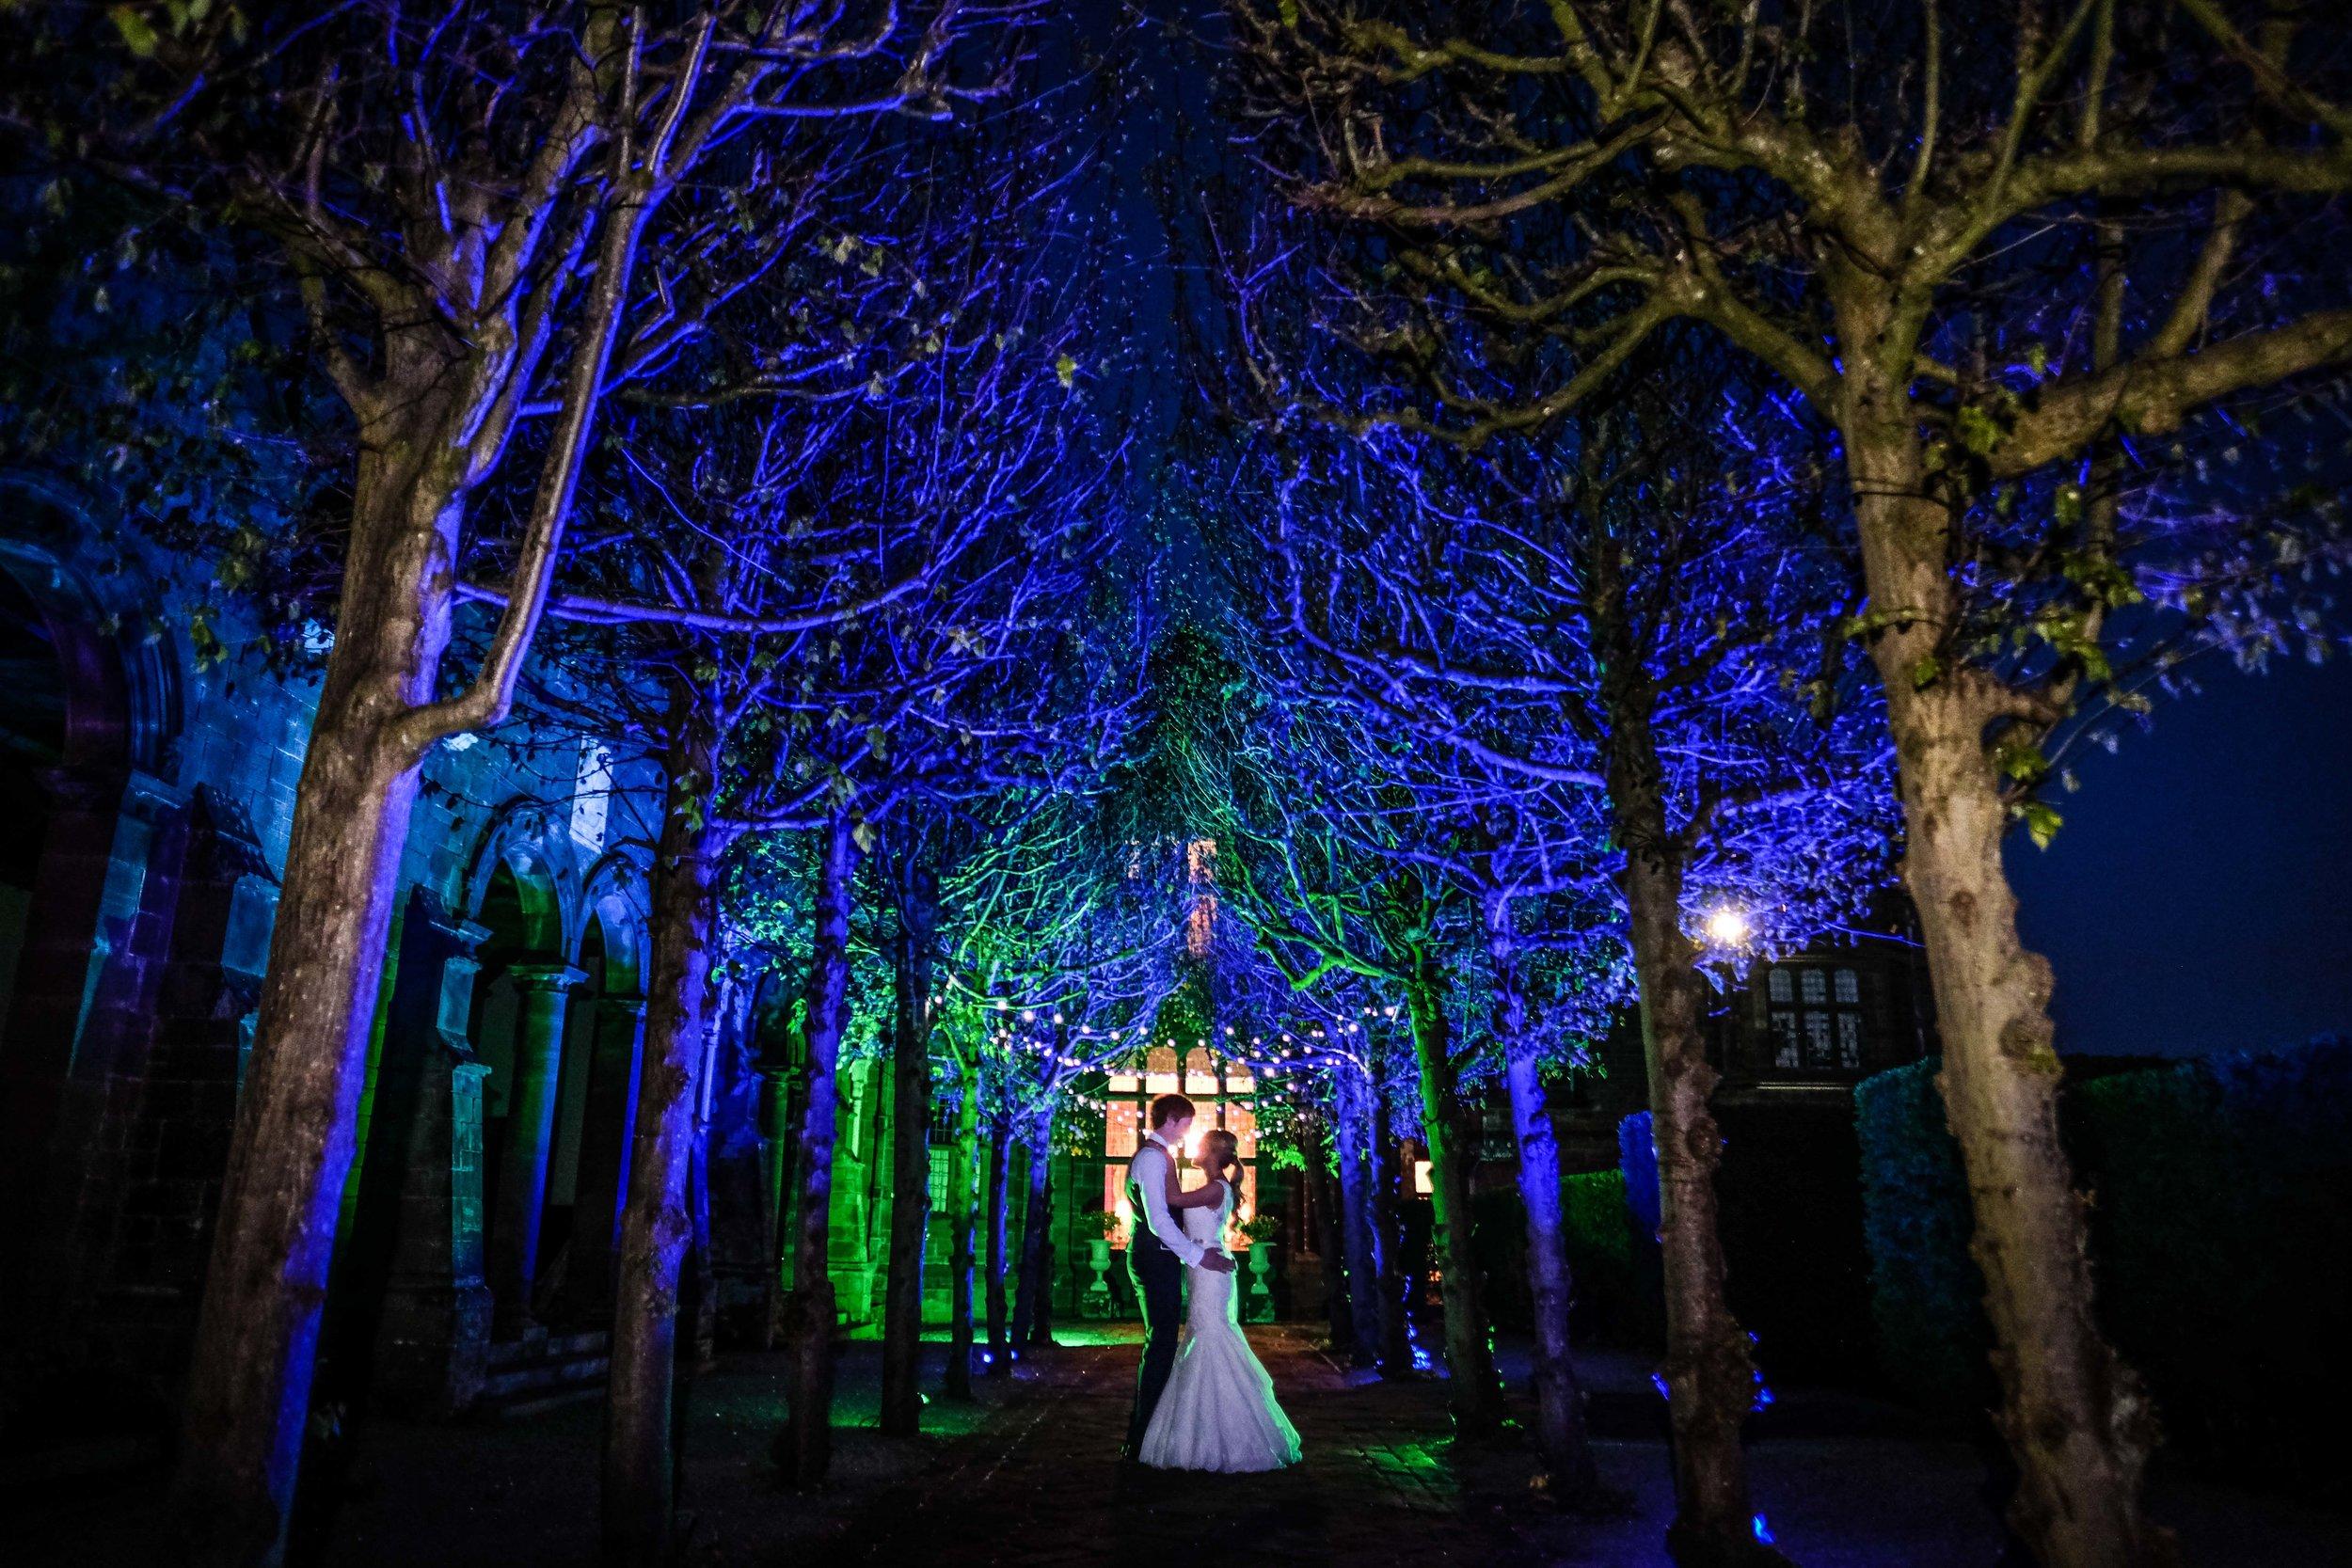 Thornton manor wedding photography cheshire wedding photographer liverpool manchester warrington chester wirral wedding BLOG (106 of 108).jpg